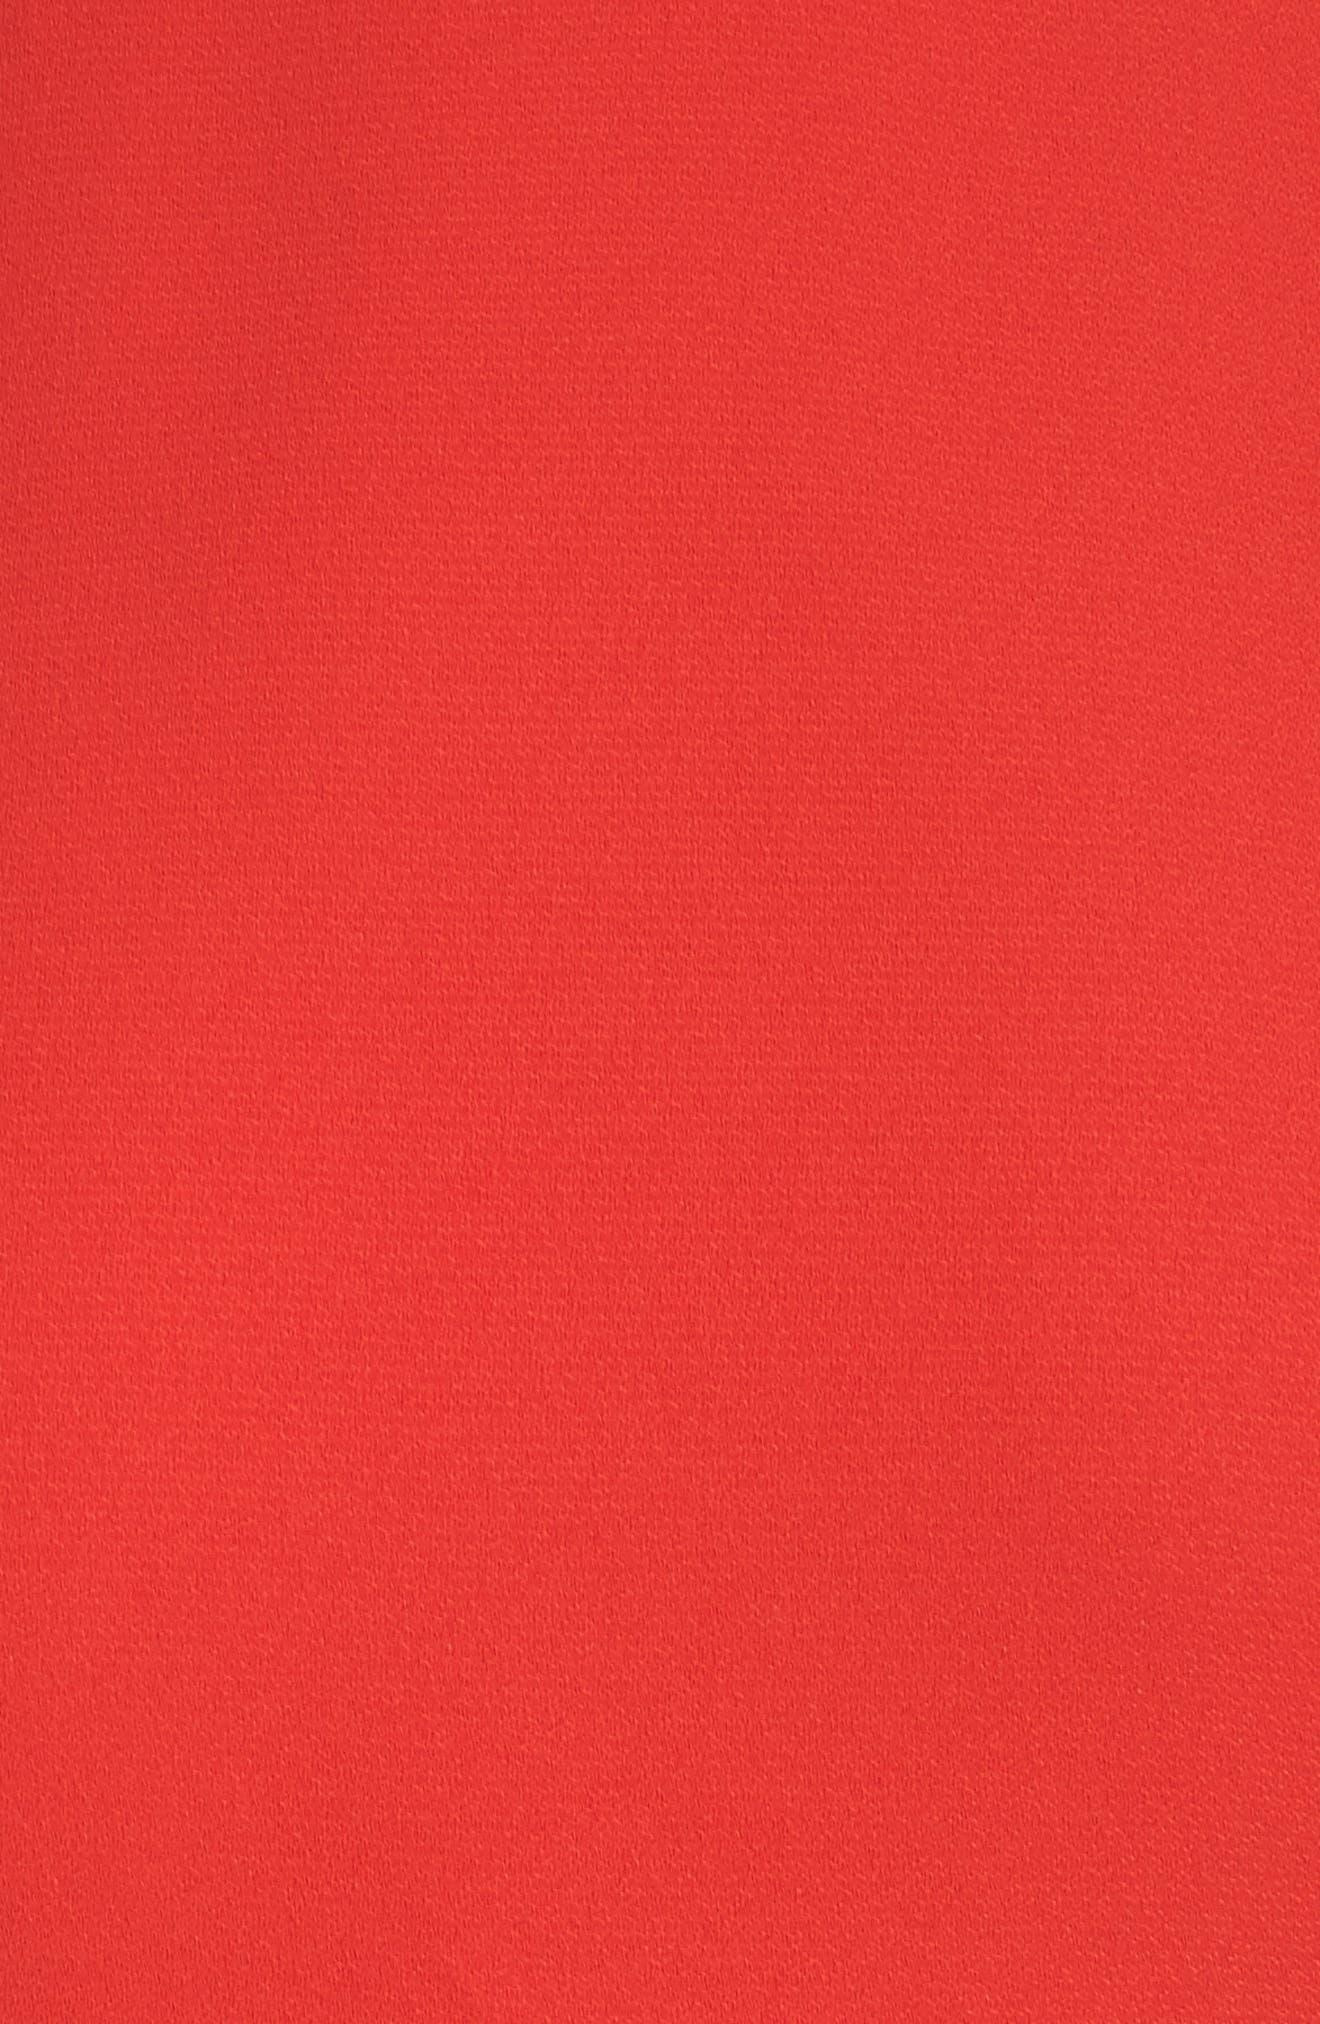 Ruffle Edge Sheath Dress,                             Alternate thumbnail 5, color,                             Coral